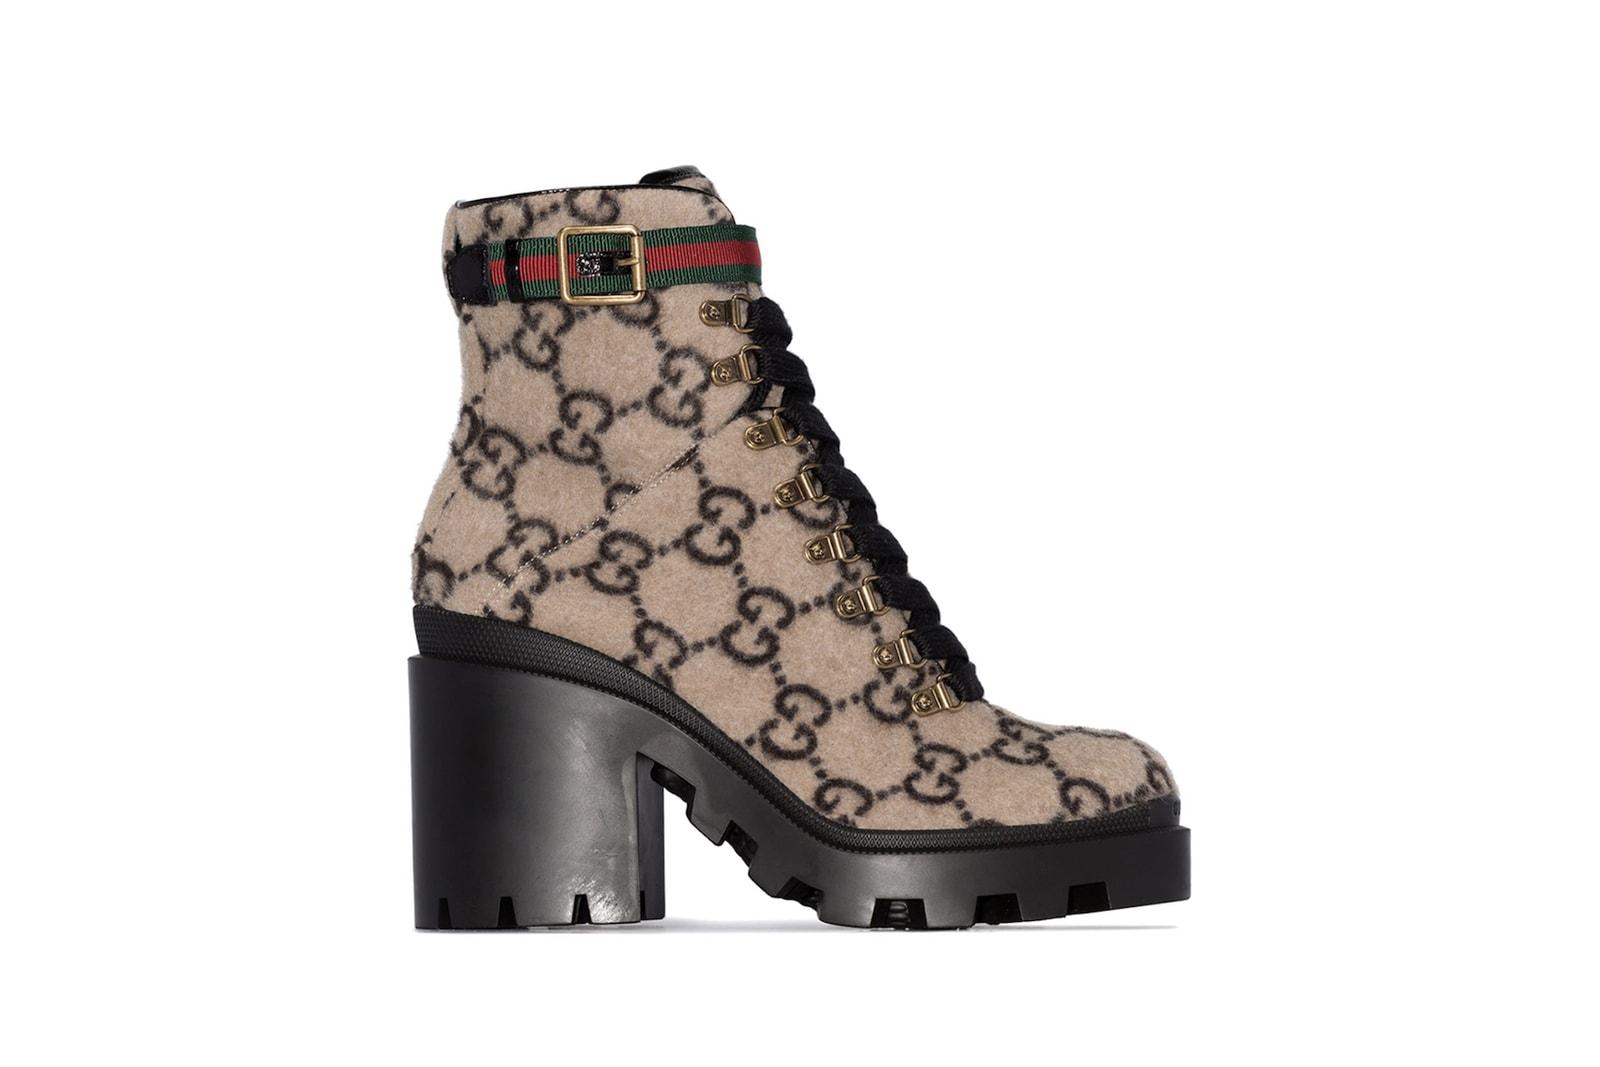 Best Fall Boots From Gucci, Vetements Marine Serre Jil Sander Shoes Fall Winter Footwear Designer Style